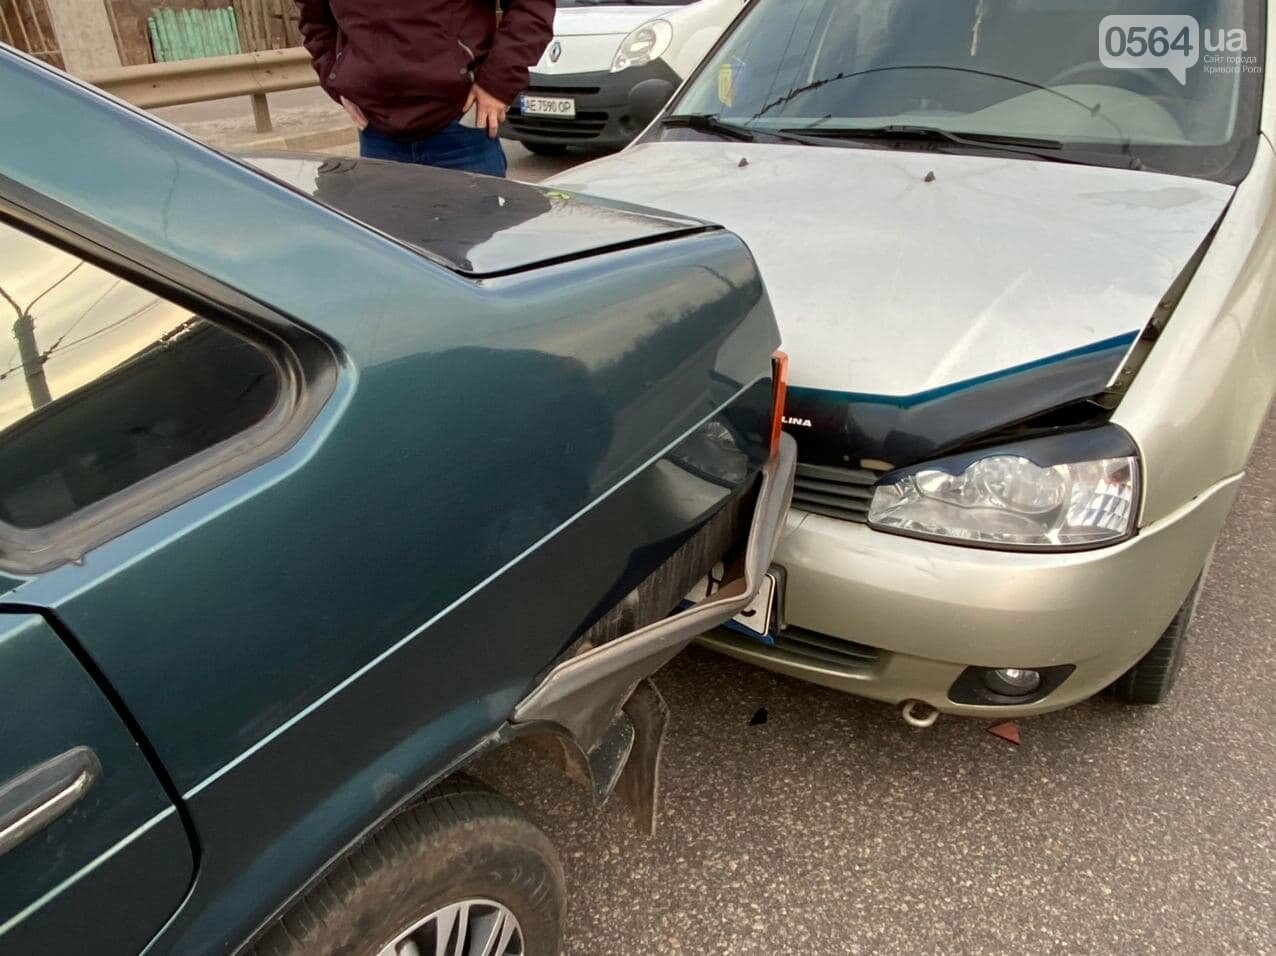 5 машин разбились в ДТП в Кривом Роге, - ФОТО, фото-4